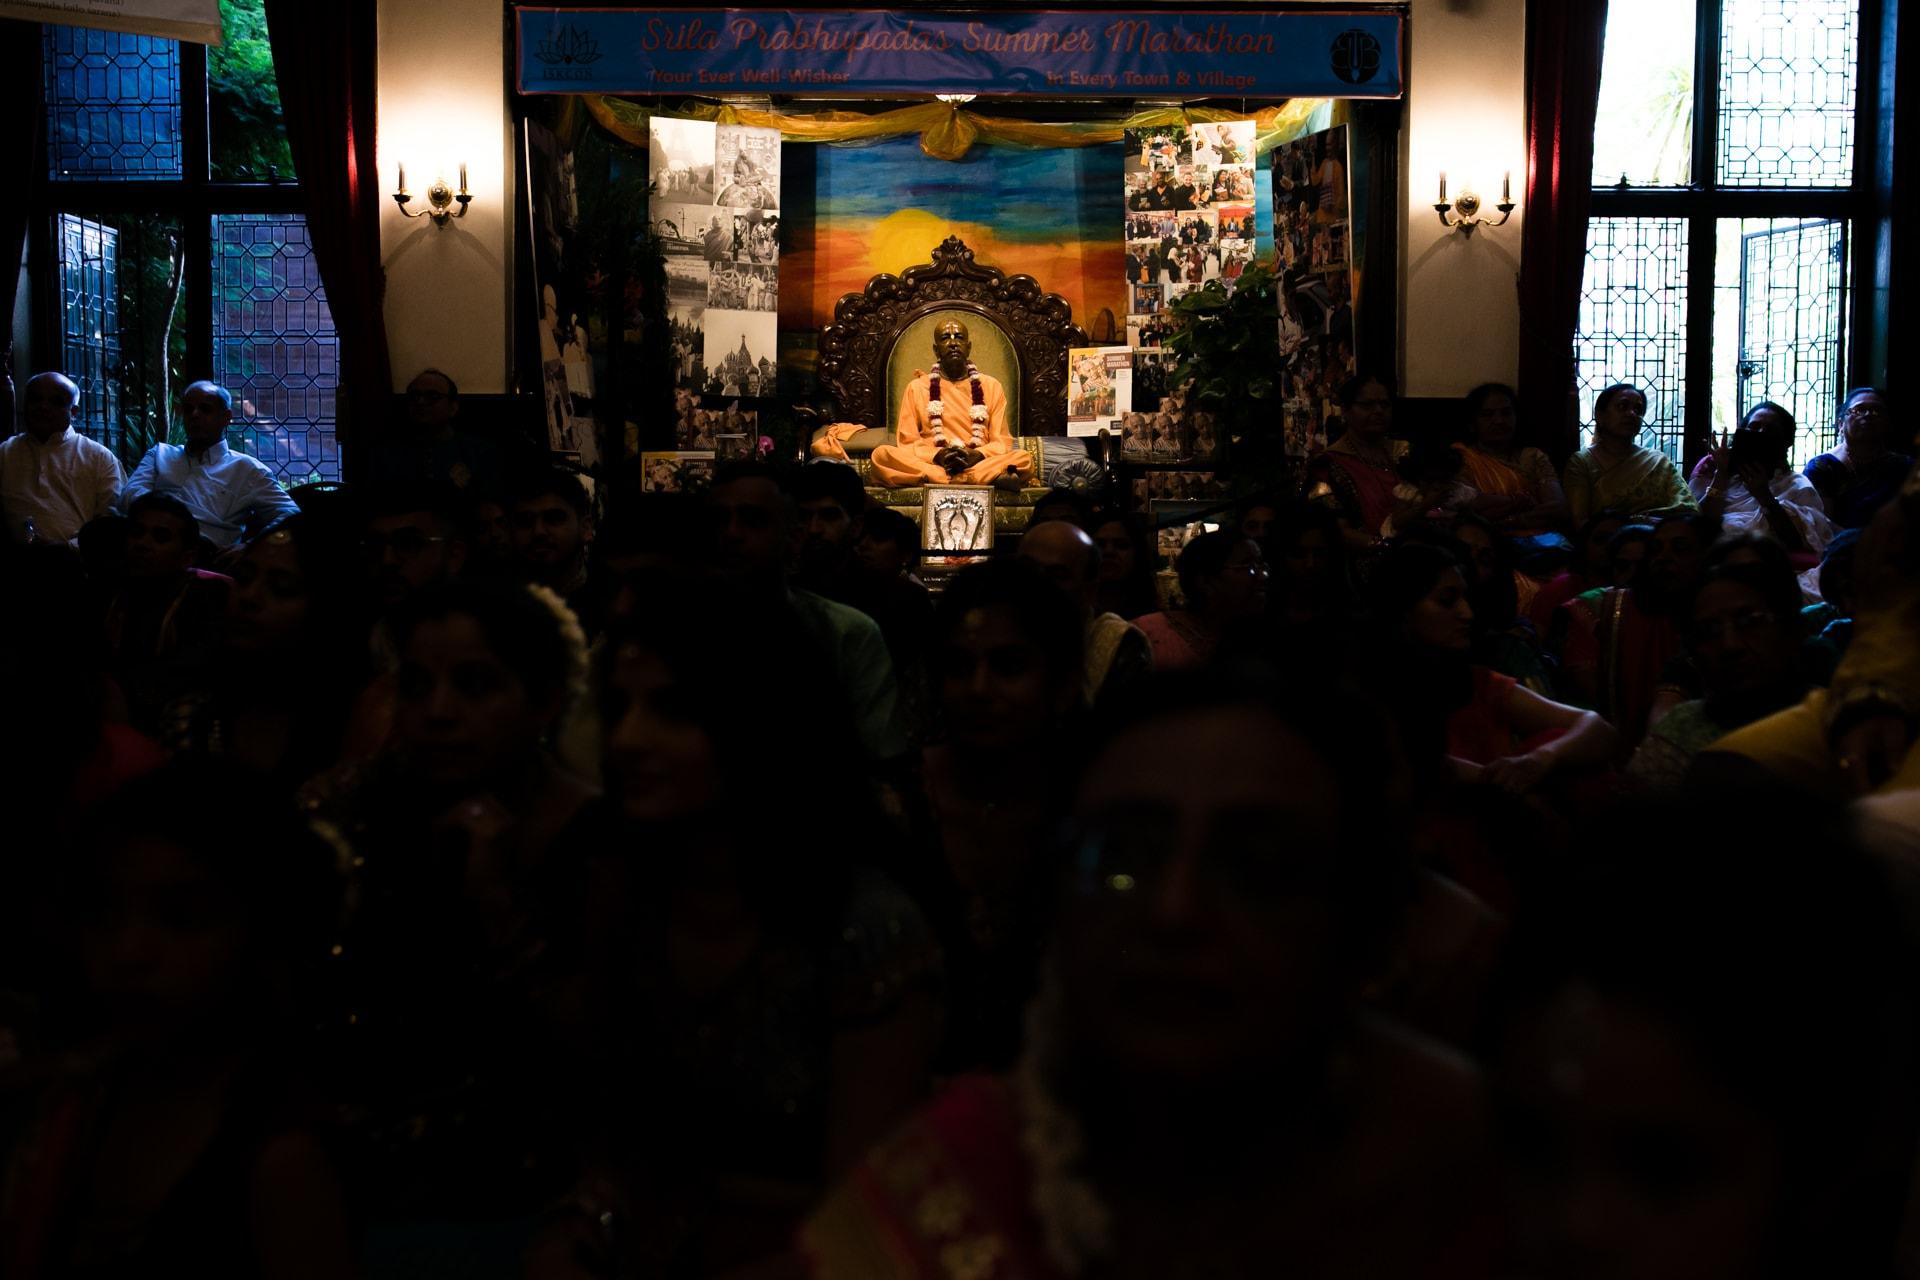 Hare Krishna Mandir